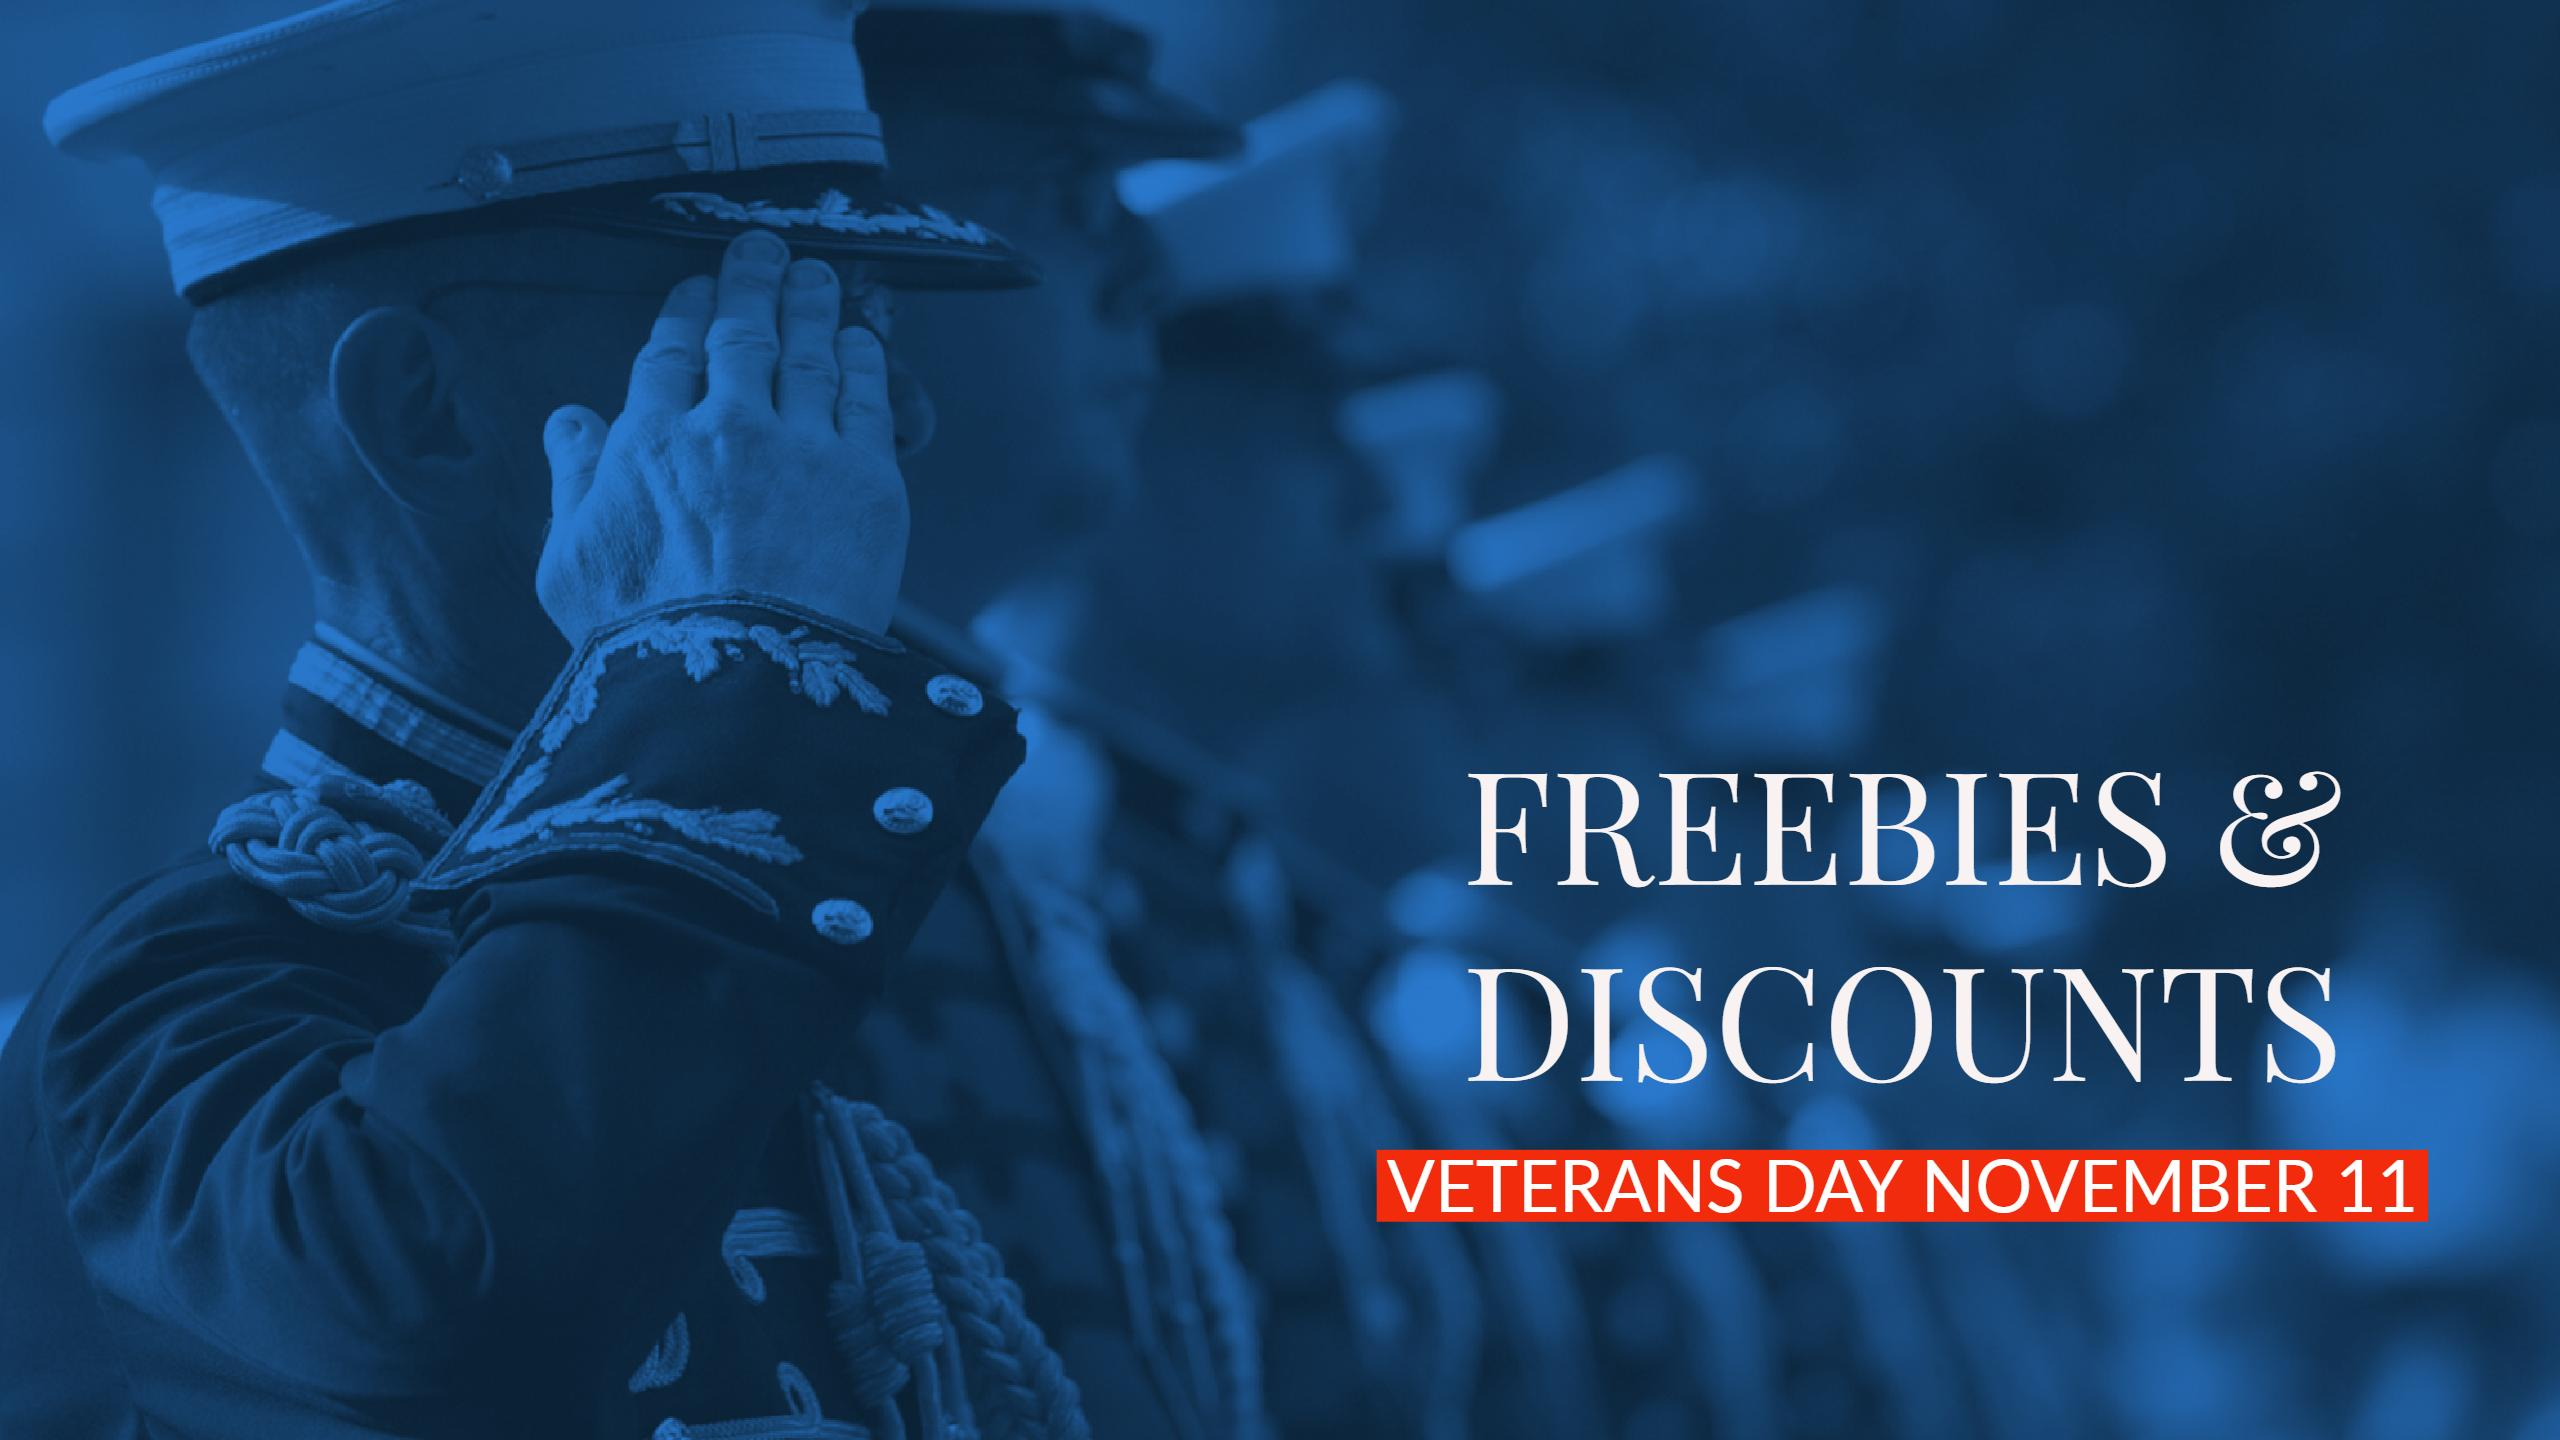 Veterans Day Discounts Freebies_505789